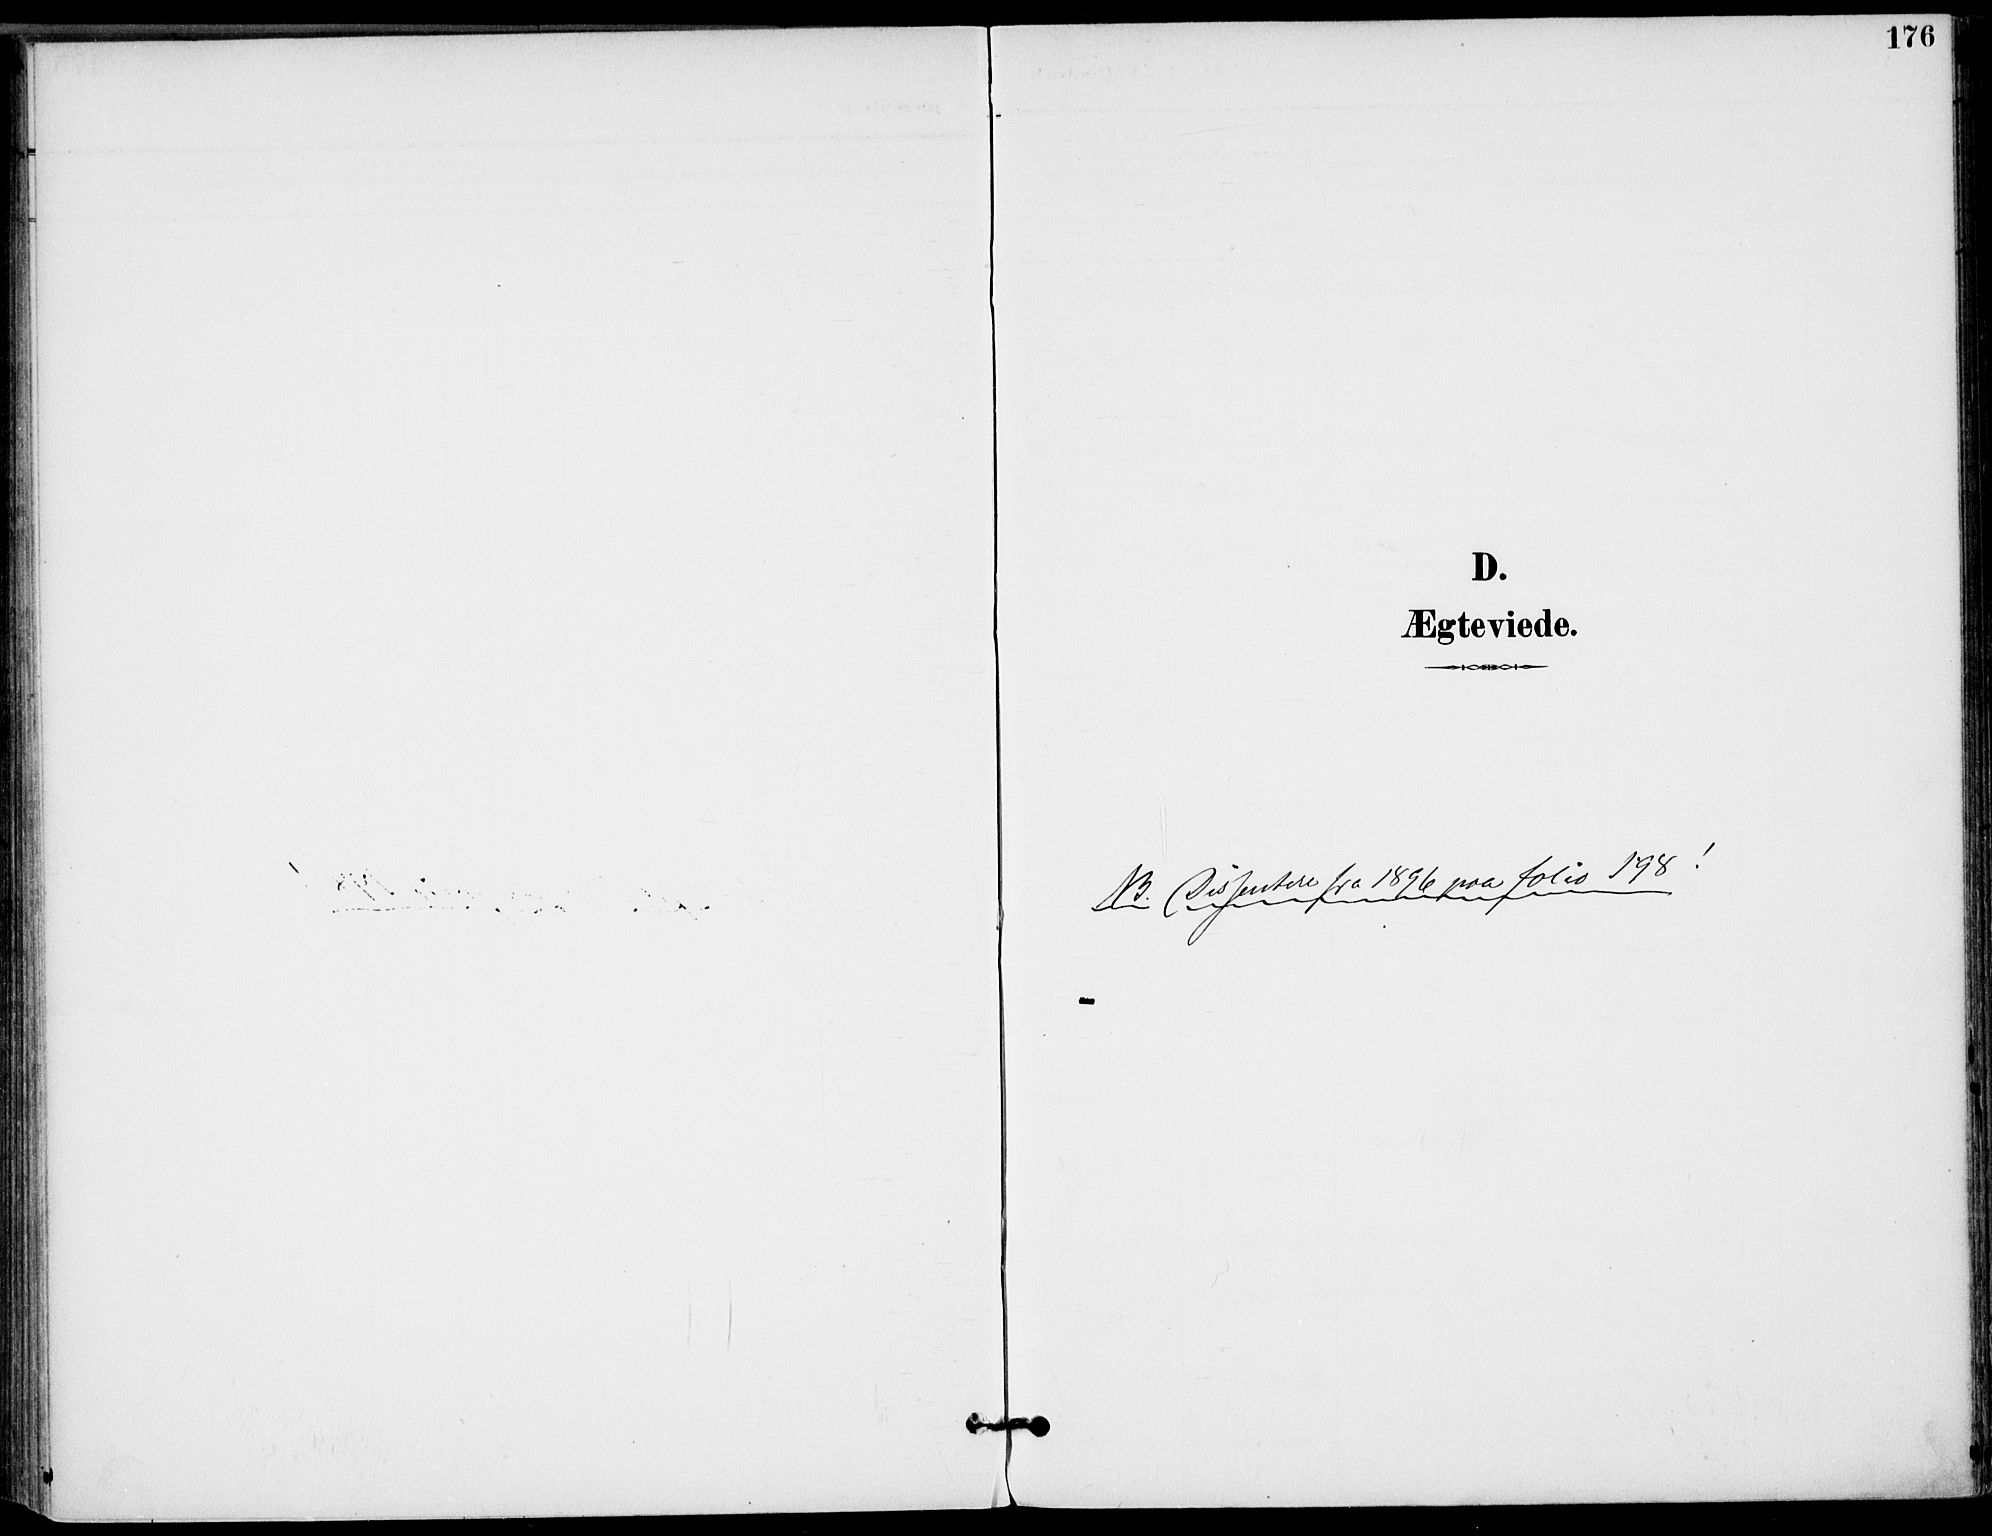 SAKO, Drangedal kirkebøker, F/Fa/L0012: Ministerialbok nr. 12, 1895-1905, s. 176